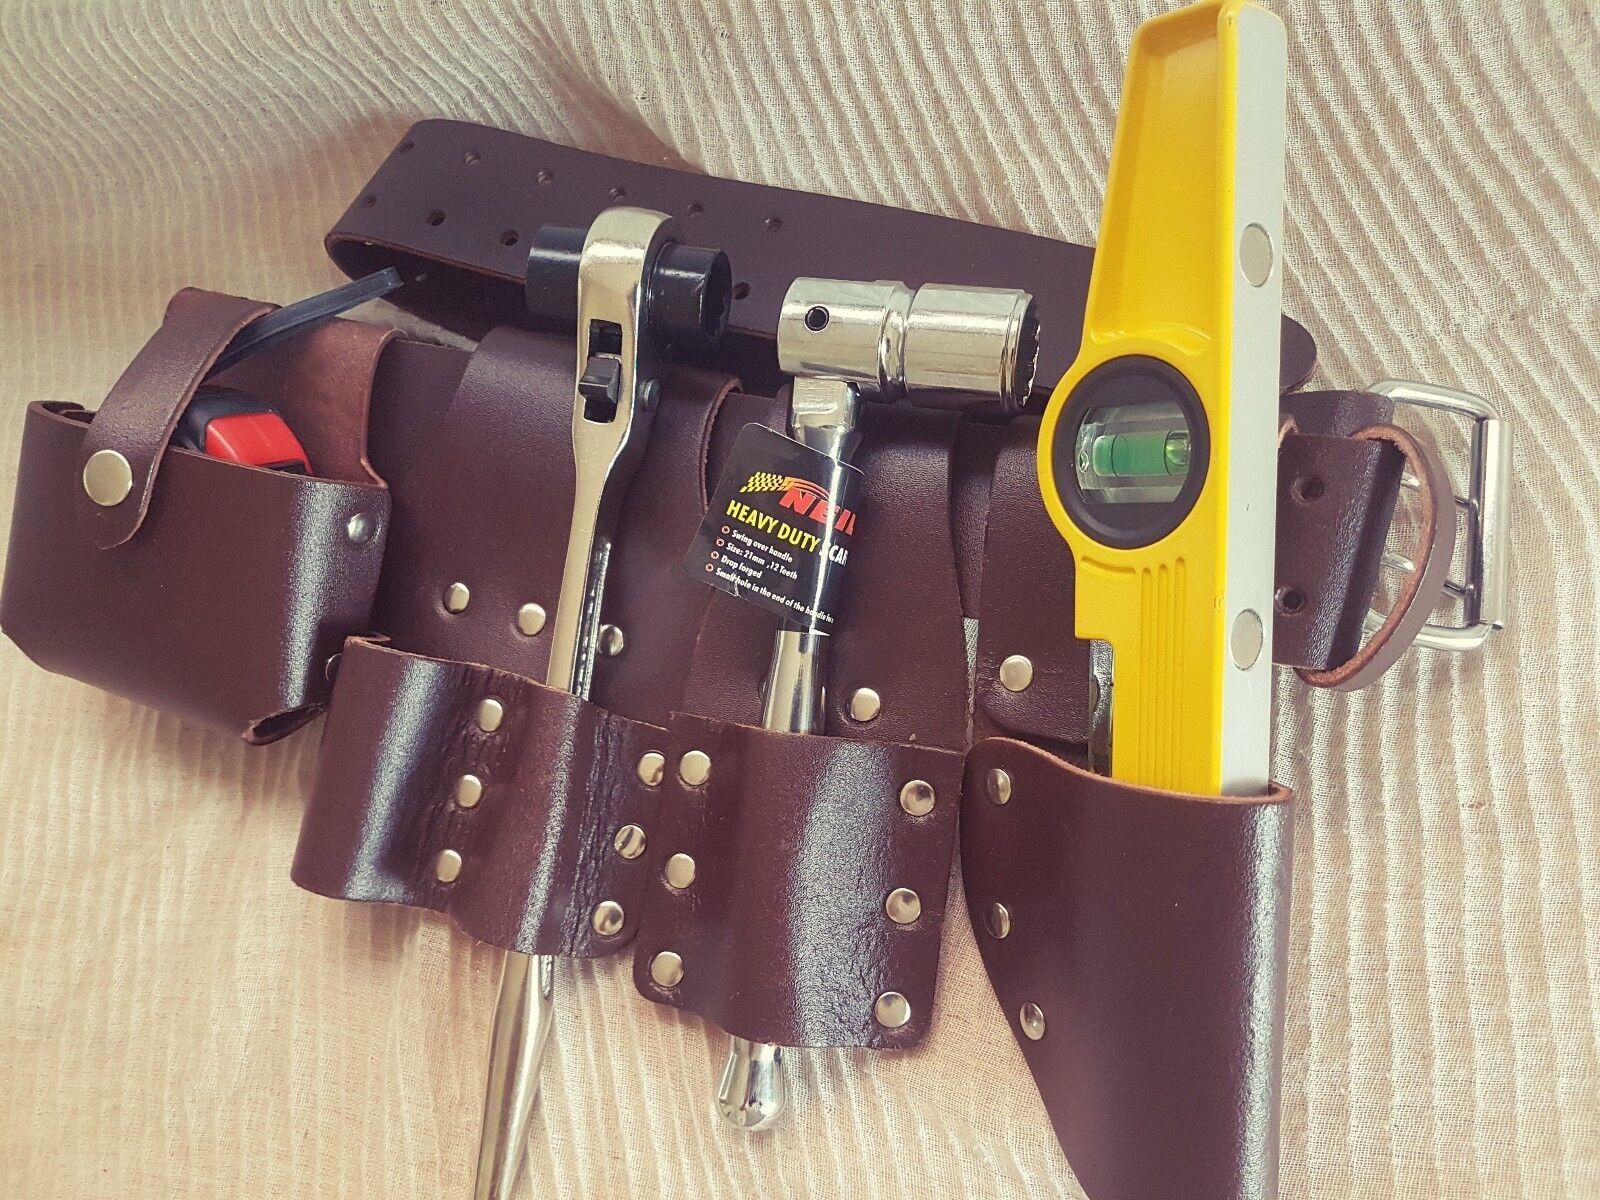 Scaffolding Brown Leather Tool Belt Full ToolSet Ratchet Spanner Level Tape